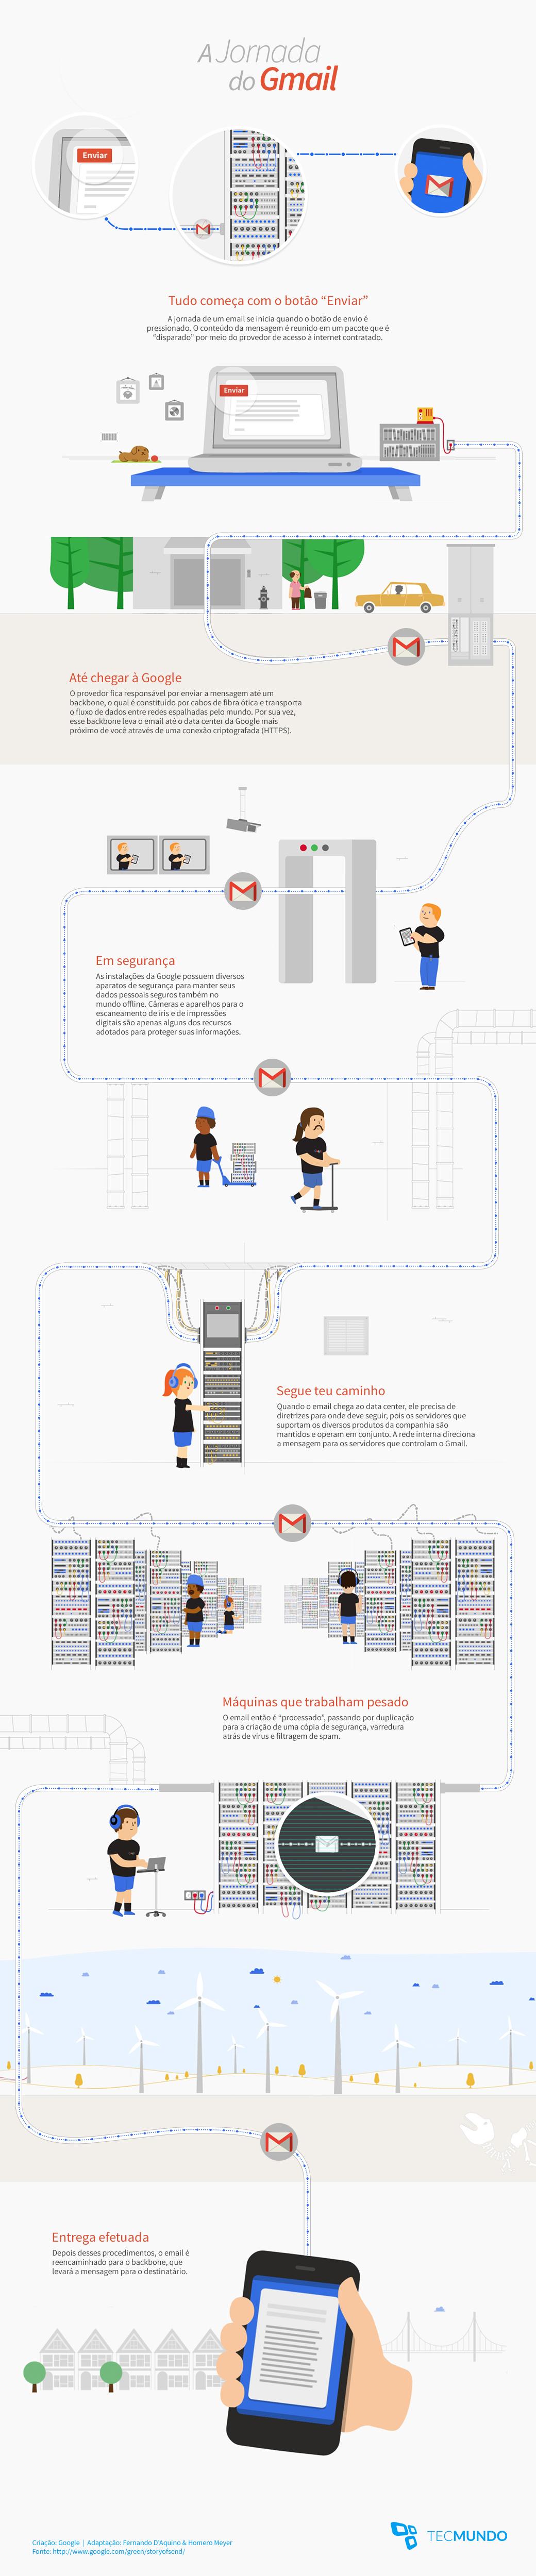 Como funciona o Gmail por dentro? [infográfico]